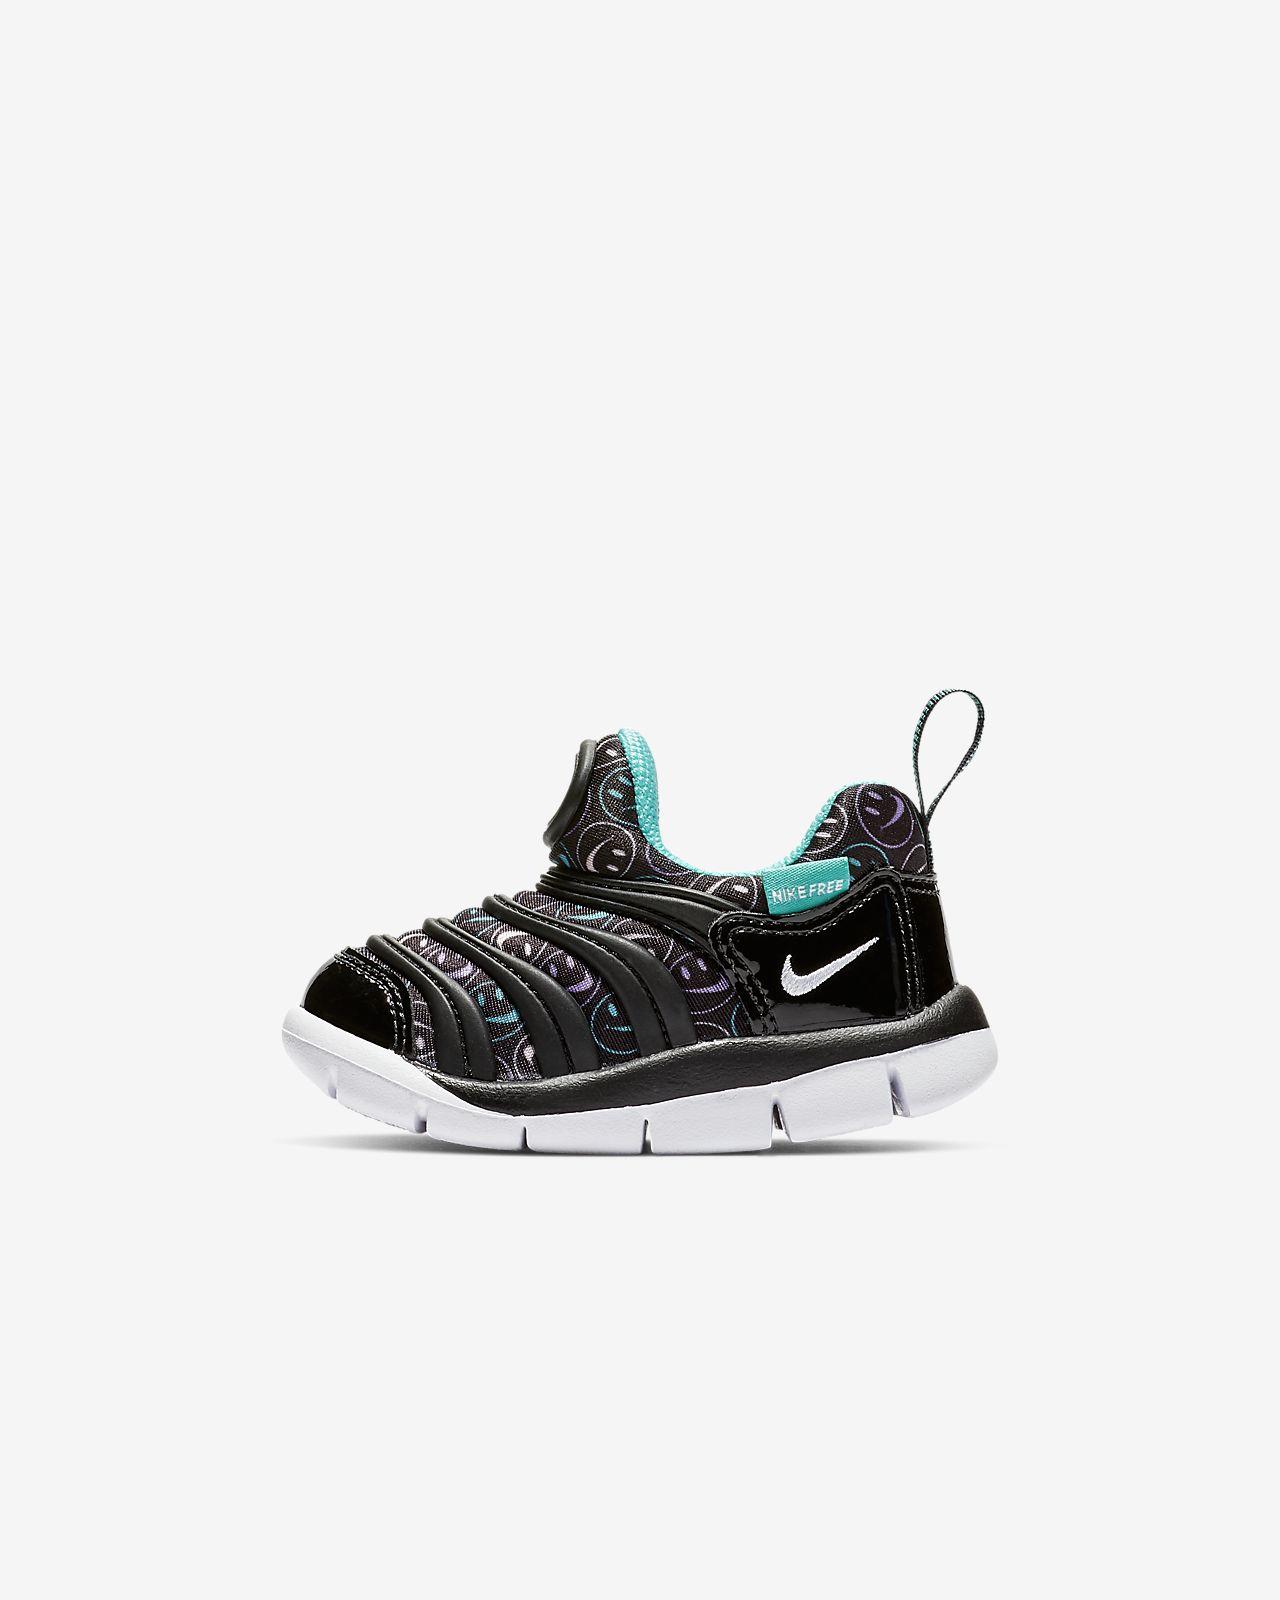 8b8748b9520 Nike Dynamo Free Infant Toddler Shoe. Nike.com